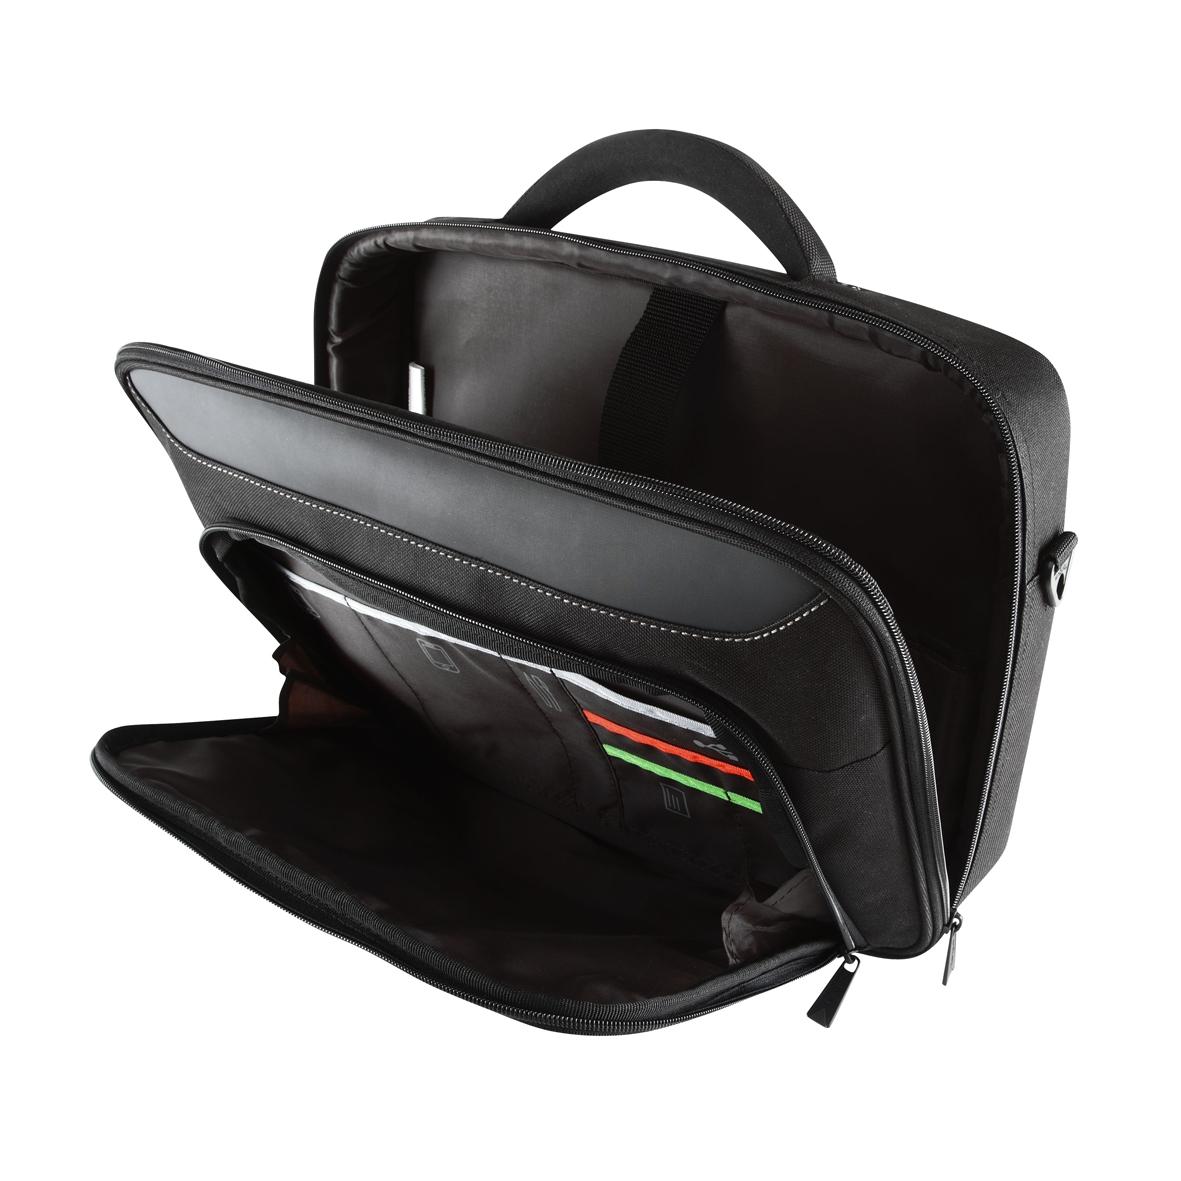 classic clamshell sacoche pour ordinateur portable 17 18. Black Bedroom Furniture Sets. Home Design Ideas